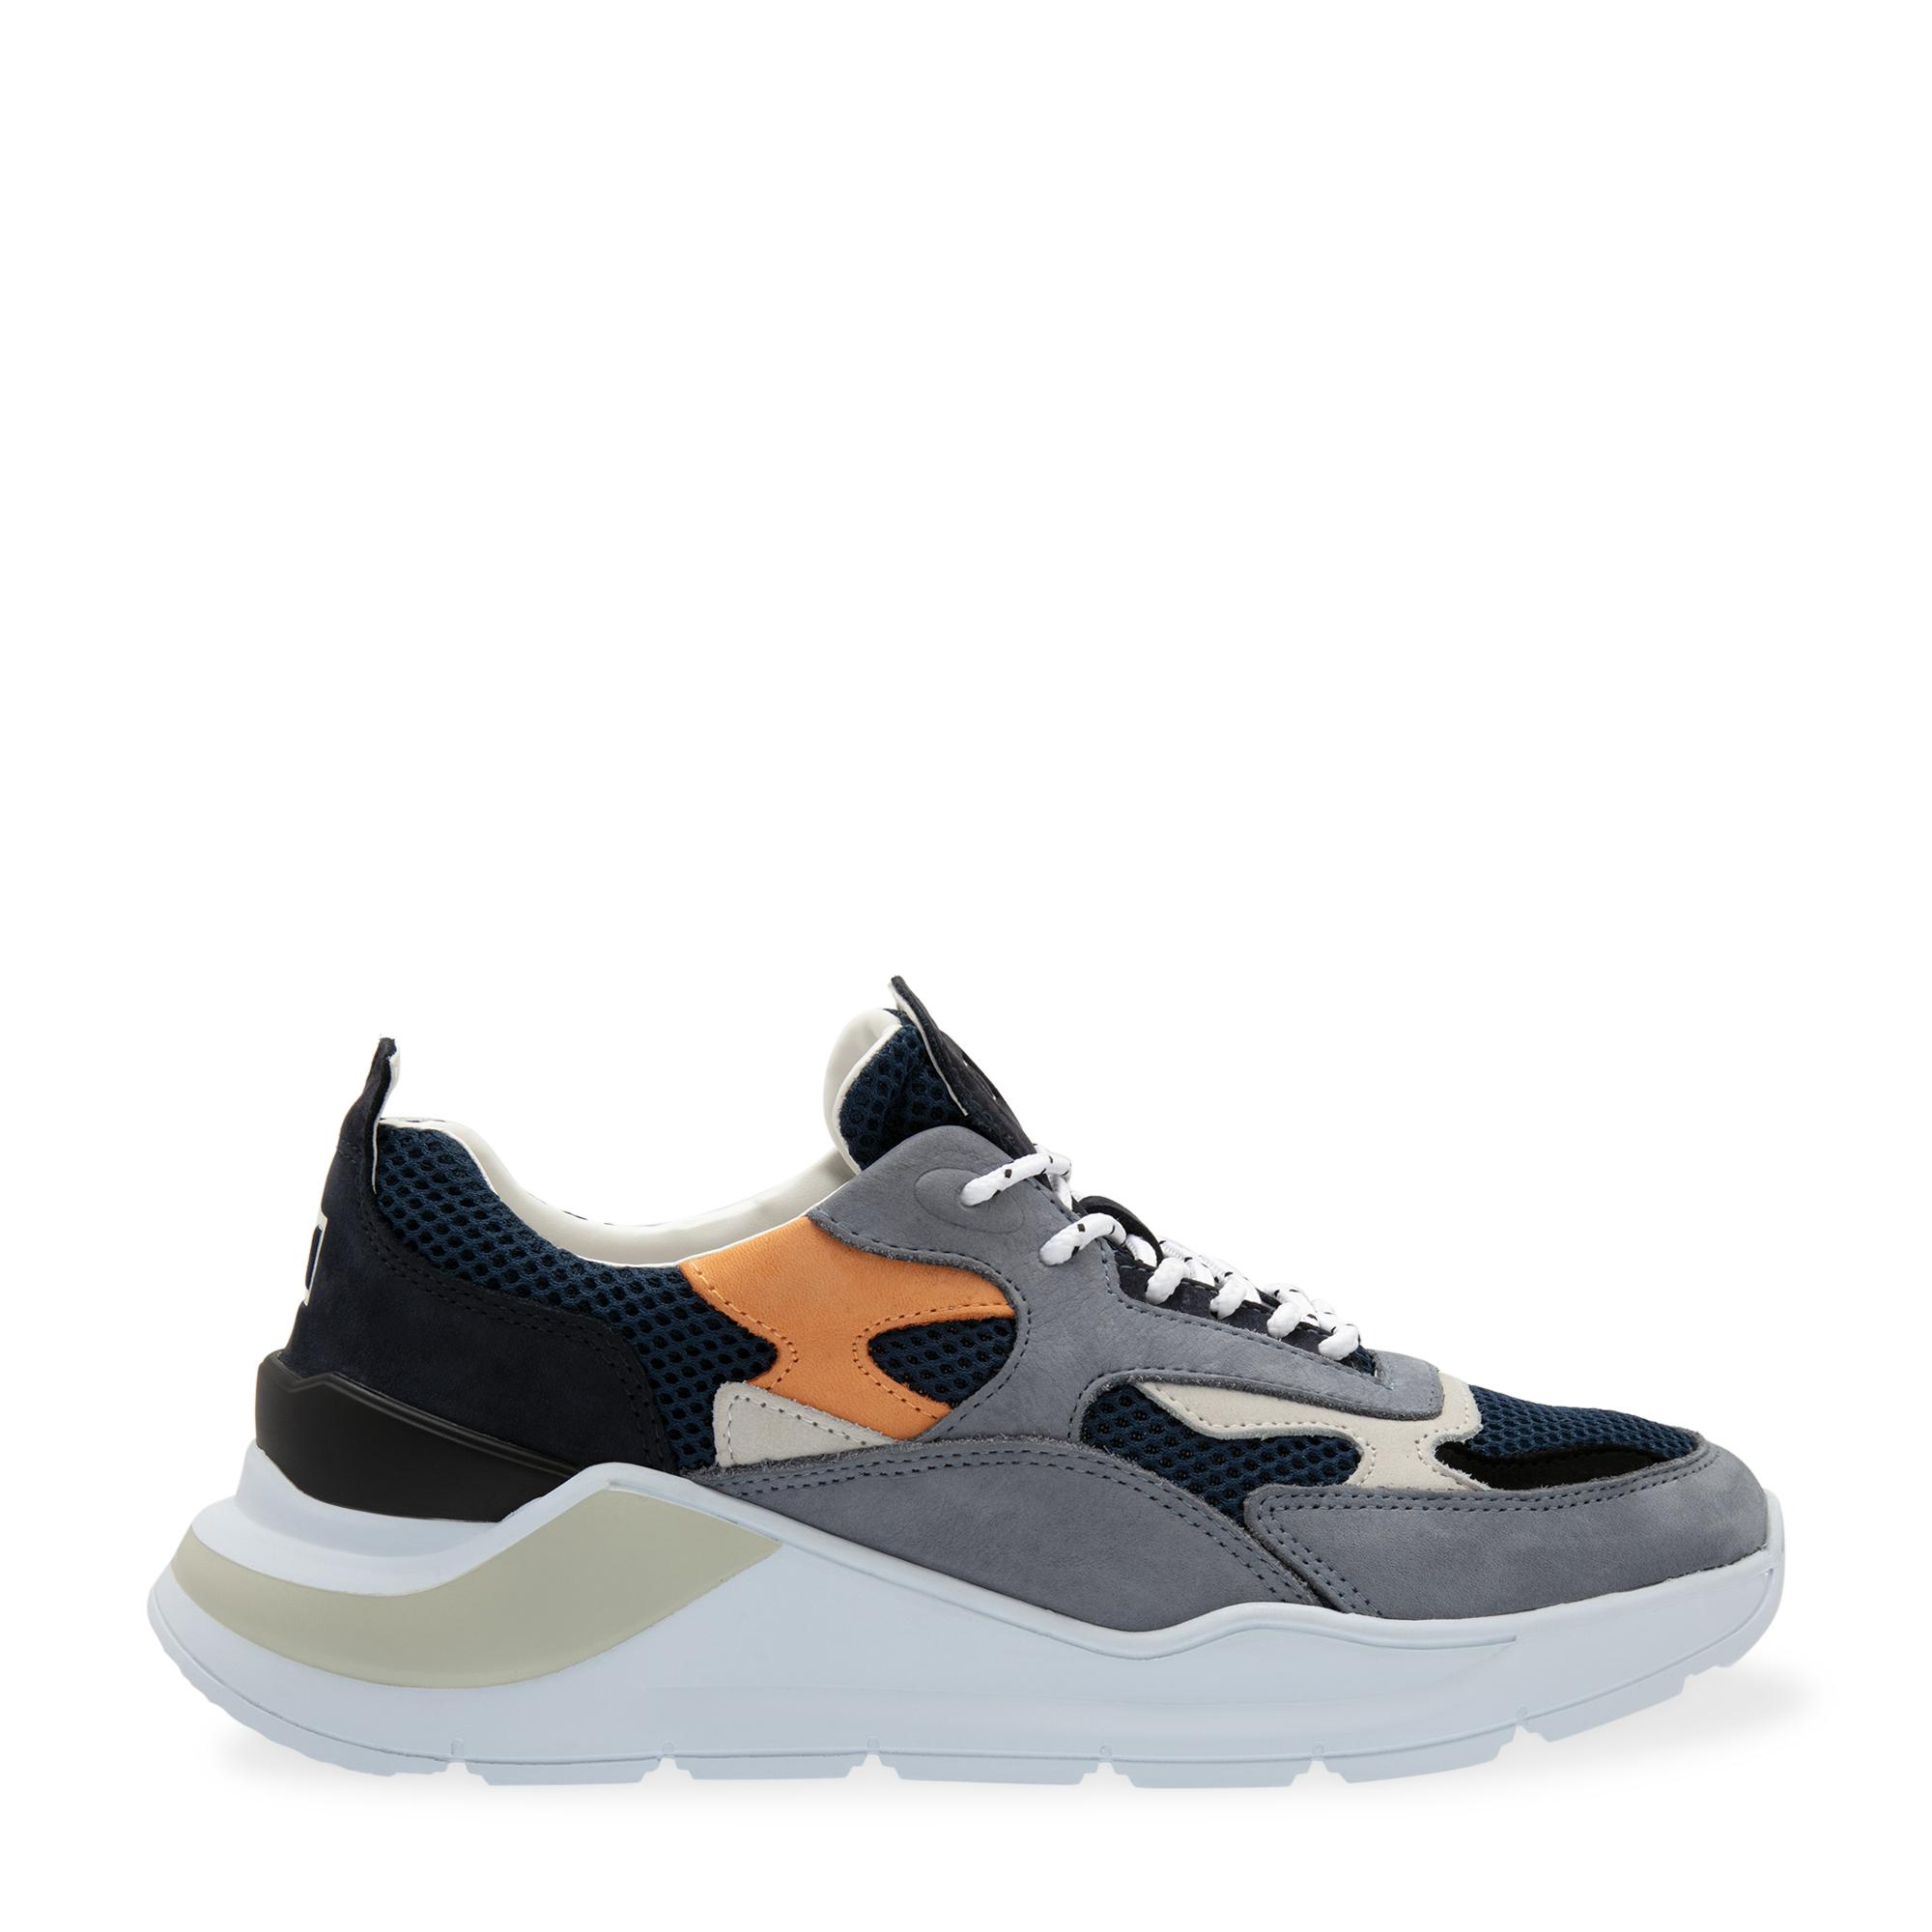 Fuga sneakers